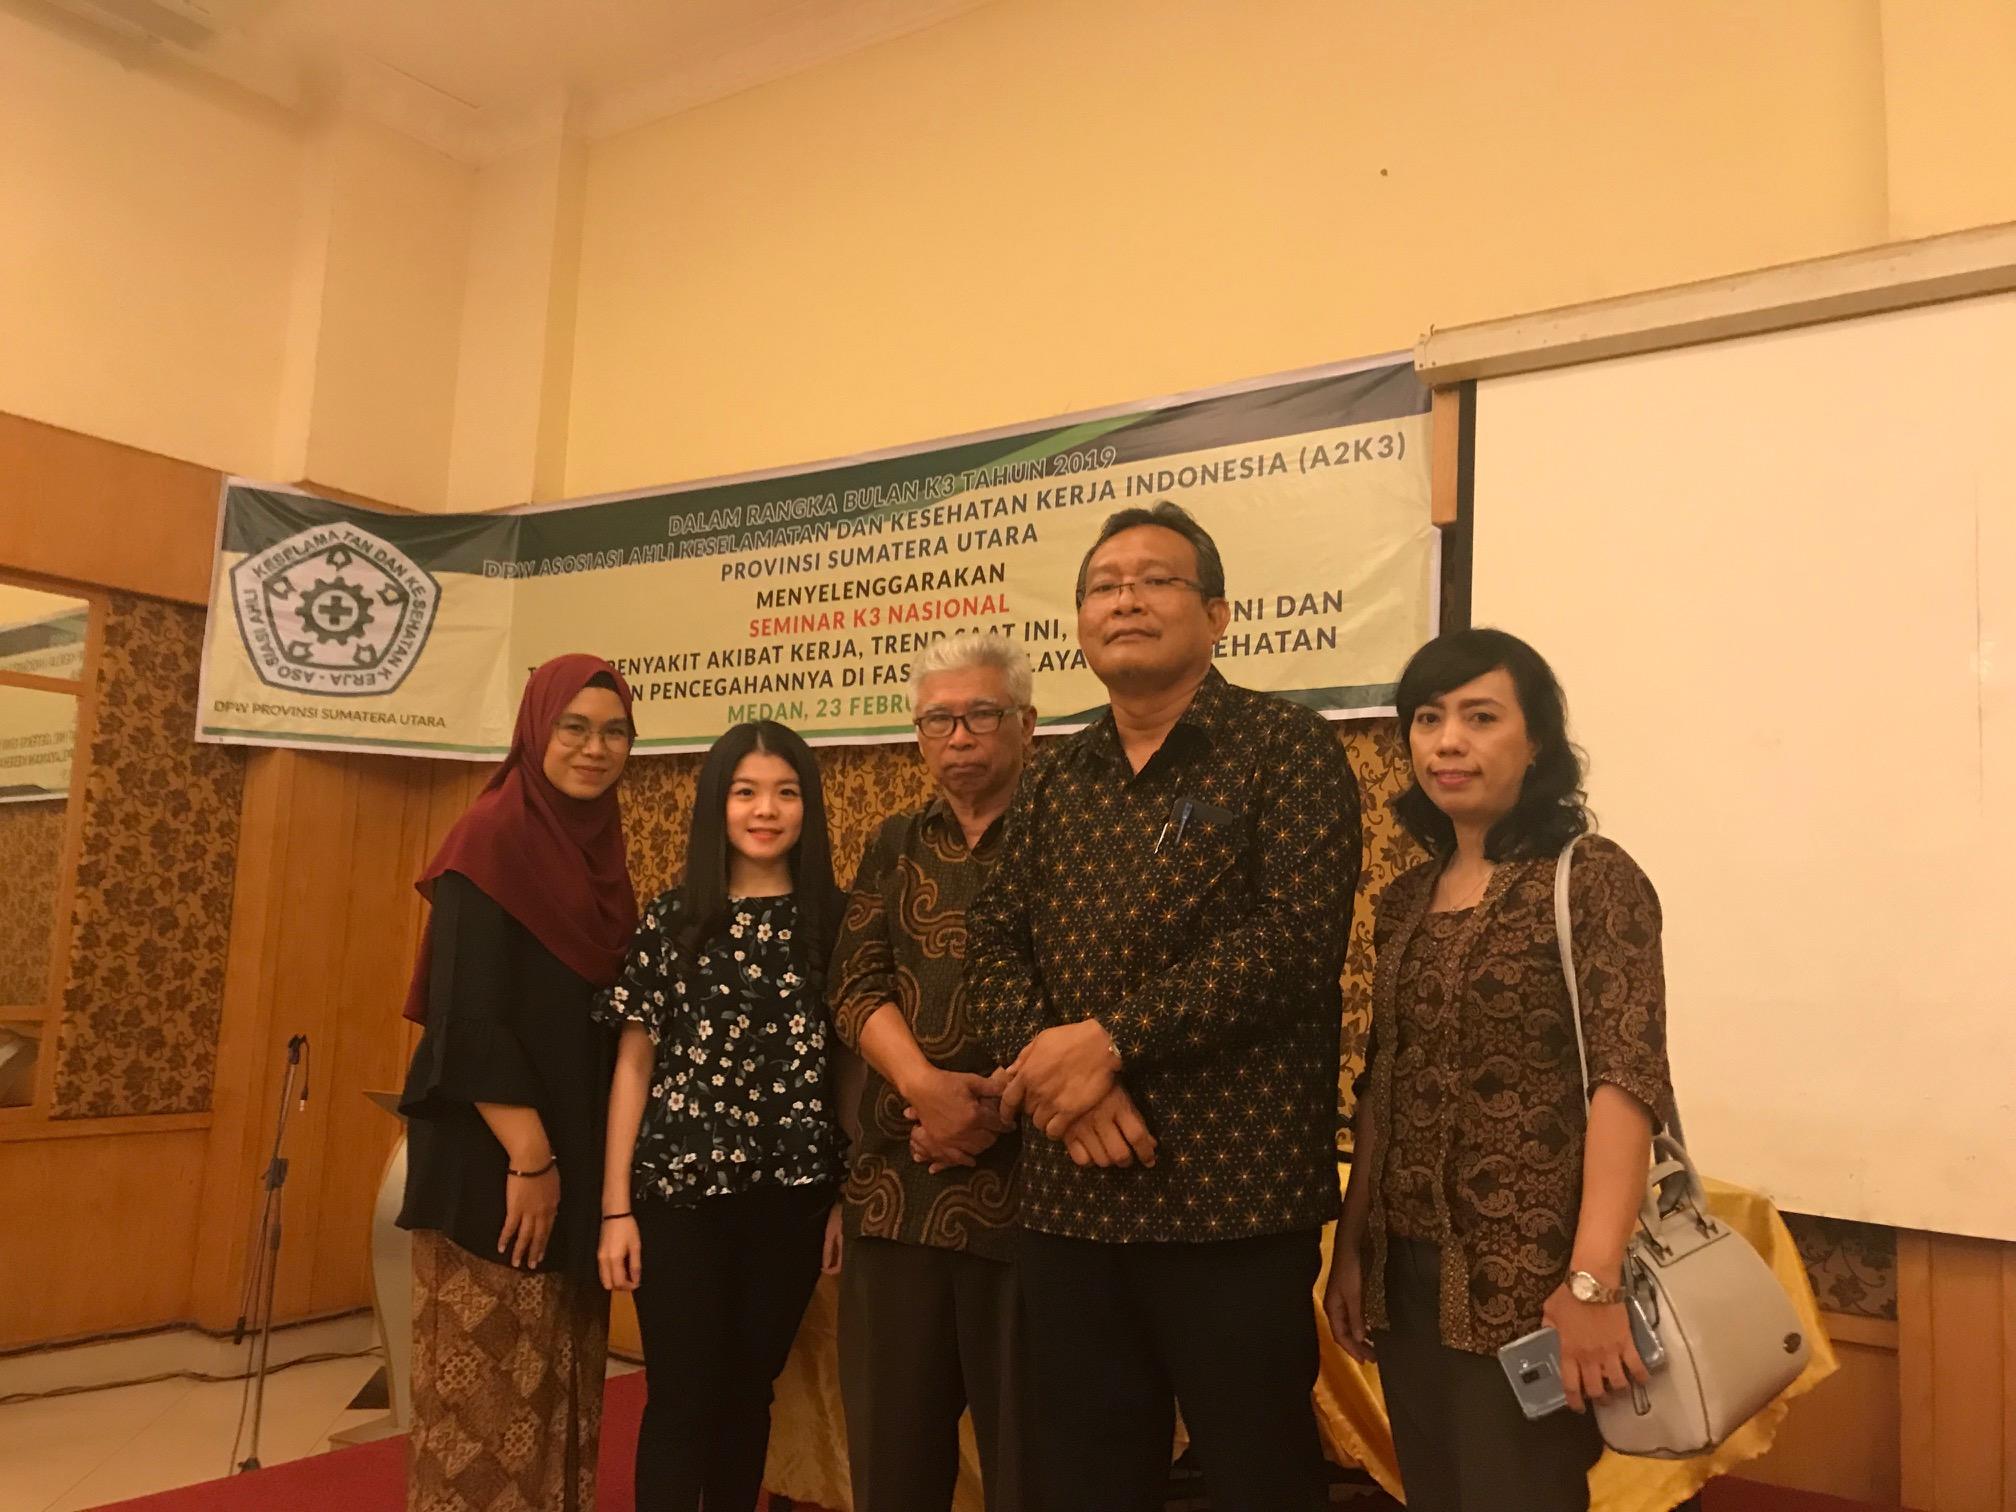 https://res.cloudinary.com/rsudeli/image/upload/v1551244396/Seminar_K3_Nasional.jpg